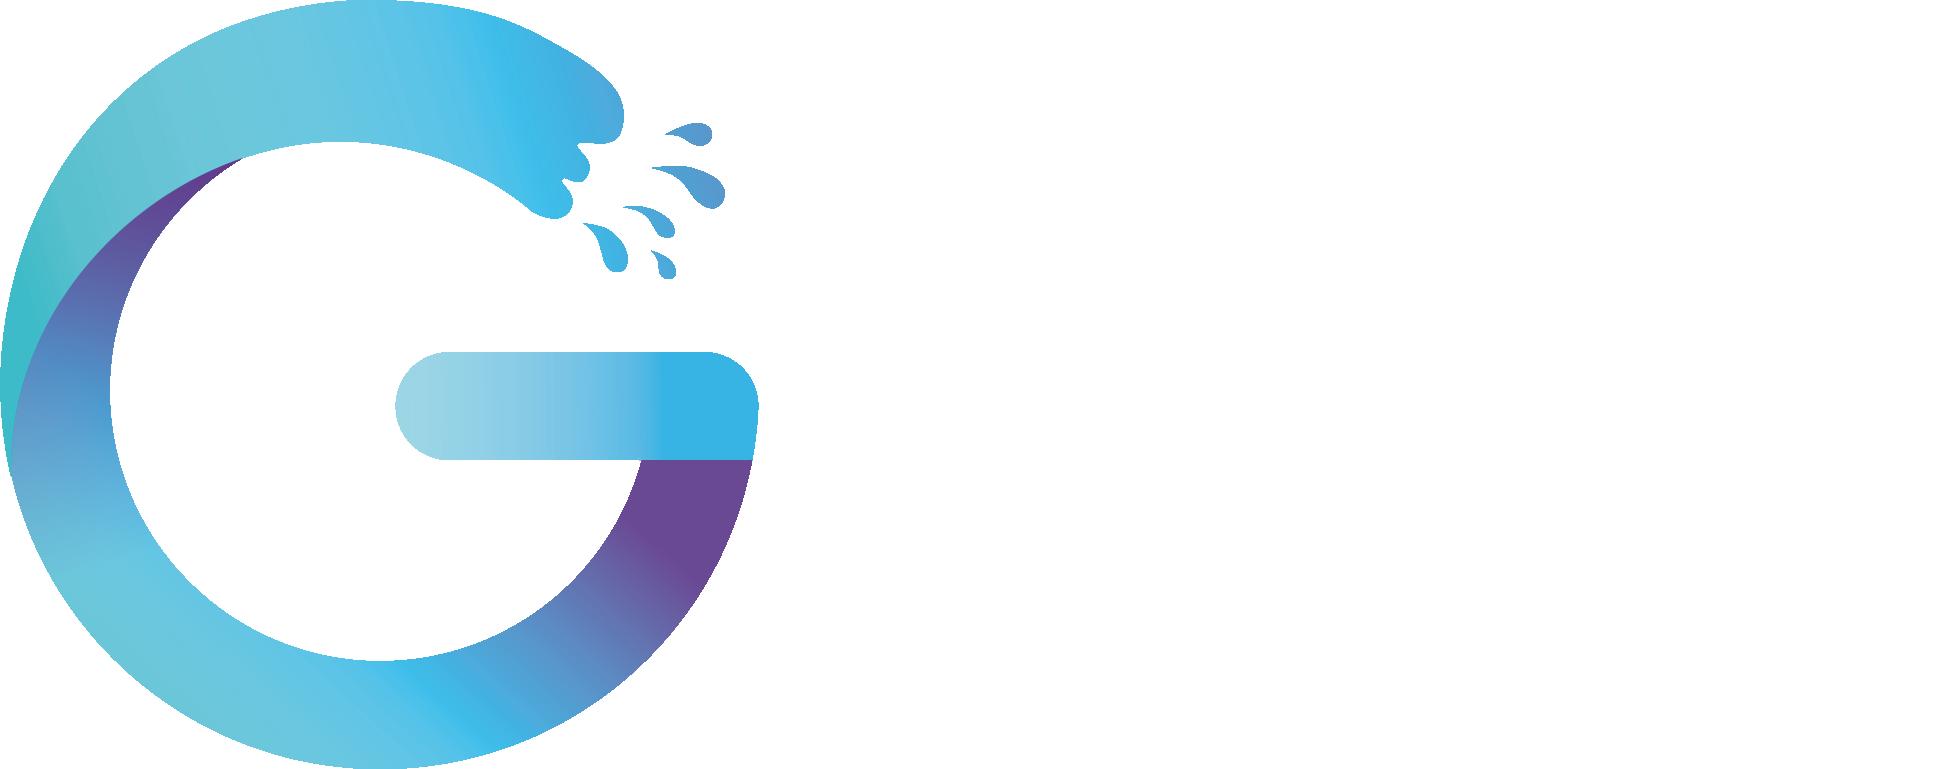 Glorify Visuals